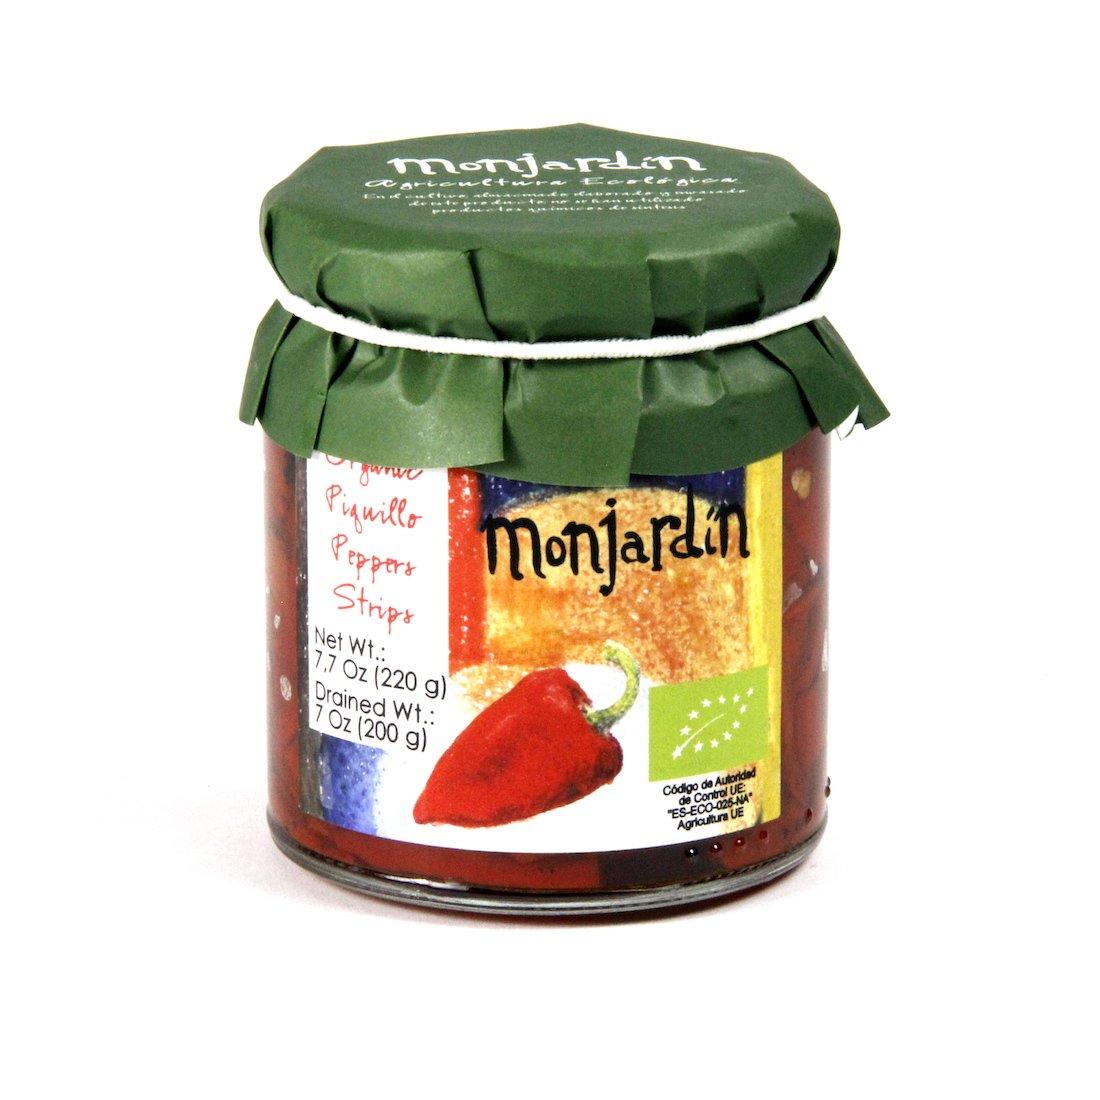 Monjardin Organic Fire-Roasted Piquillo Pepper Strips (7 oz/200 g)